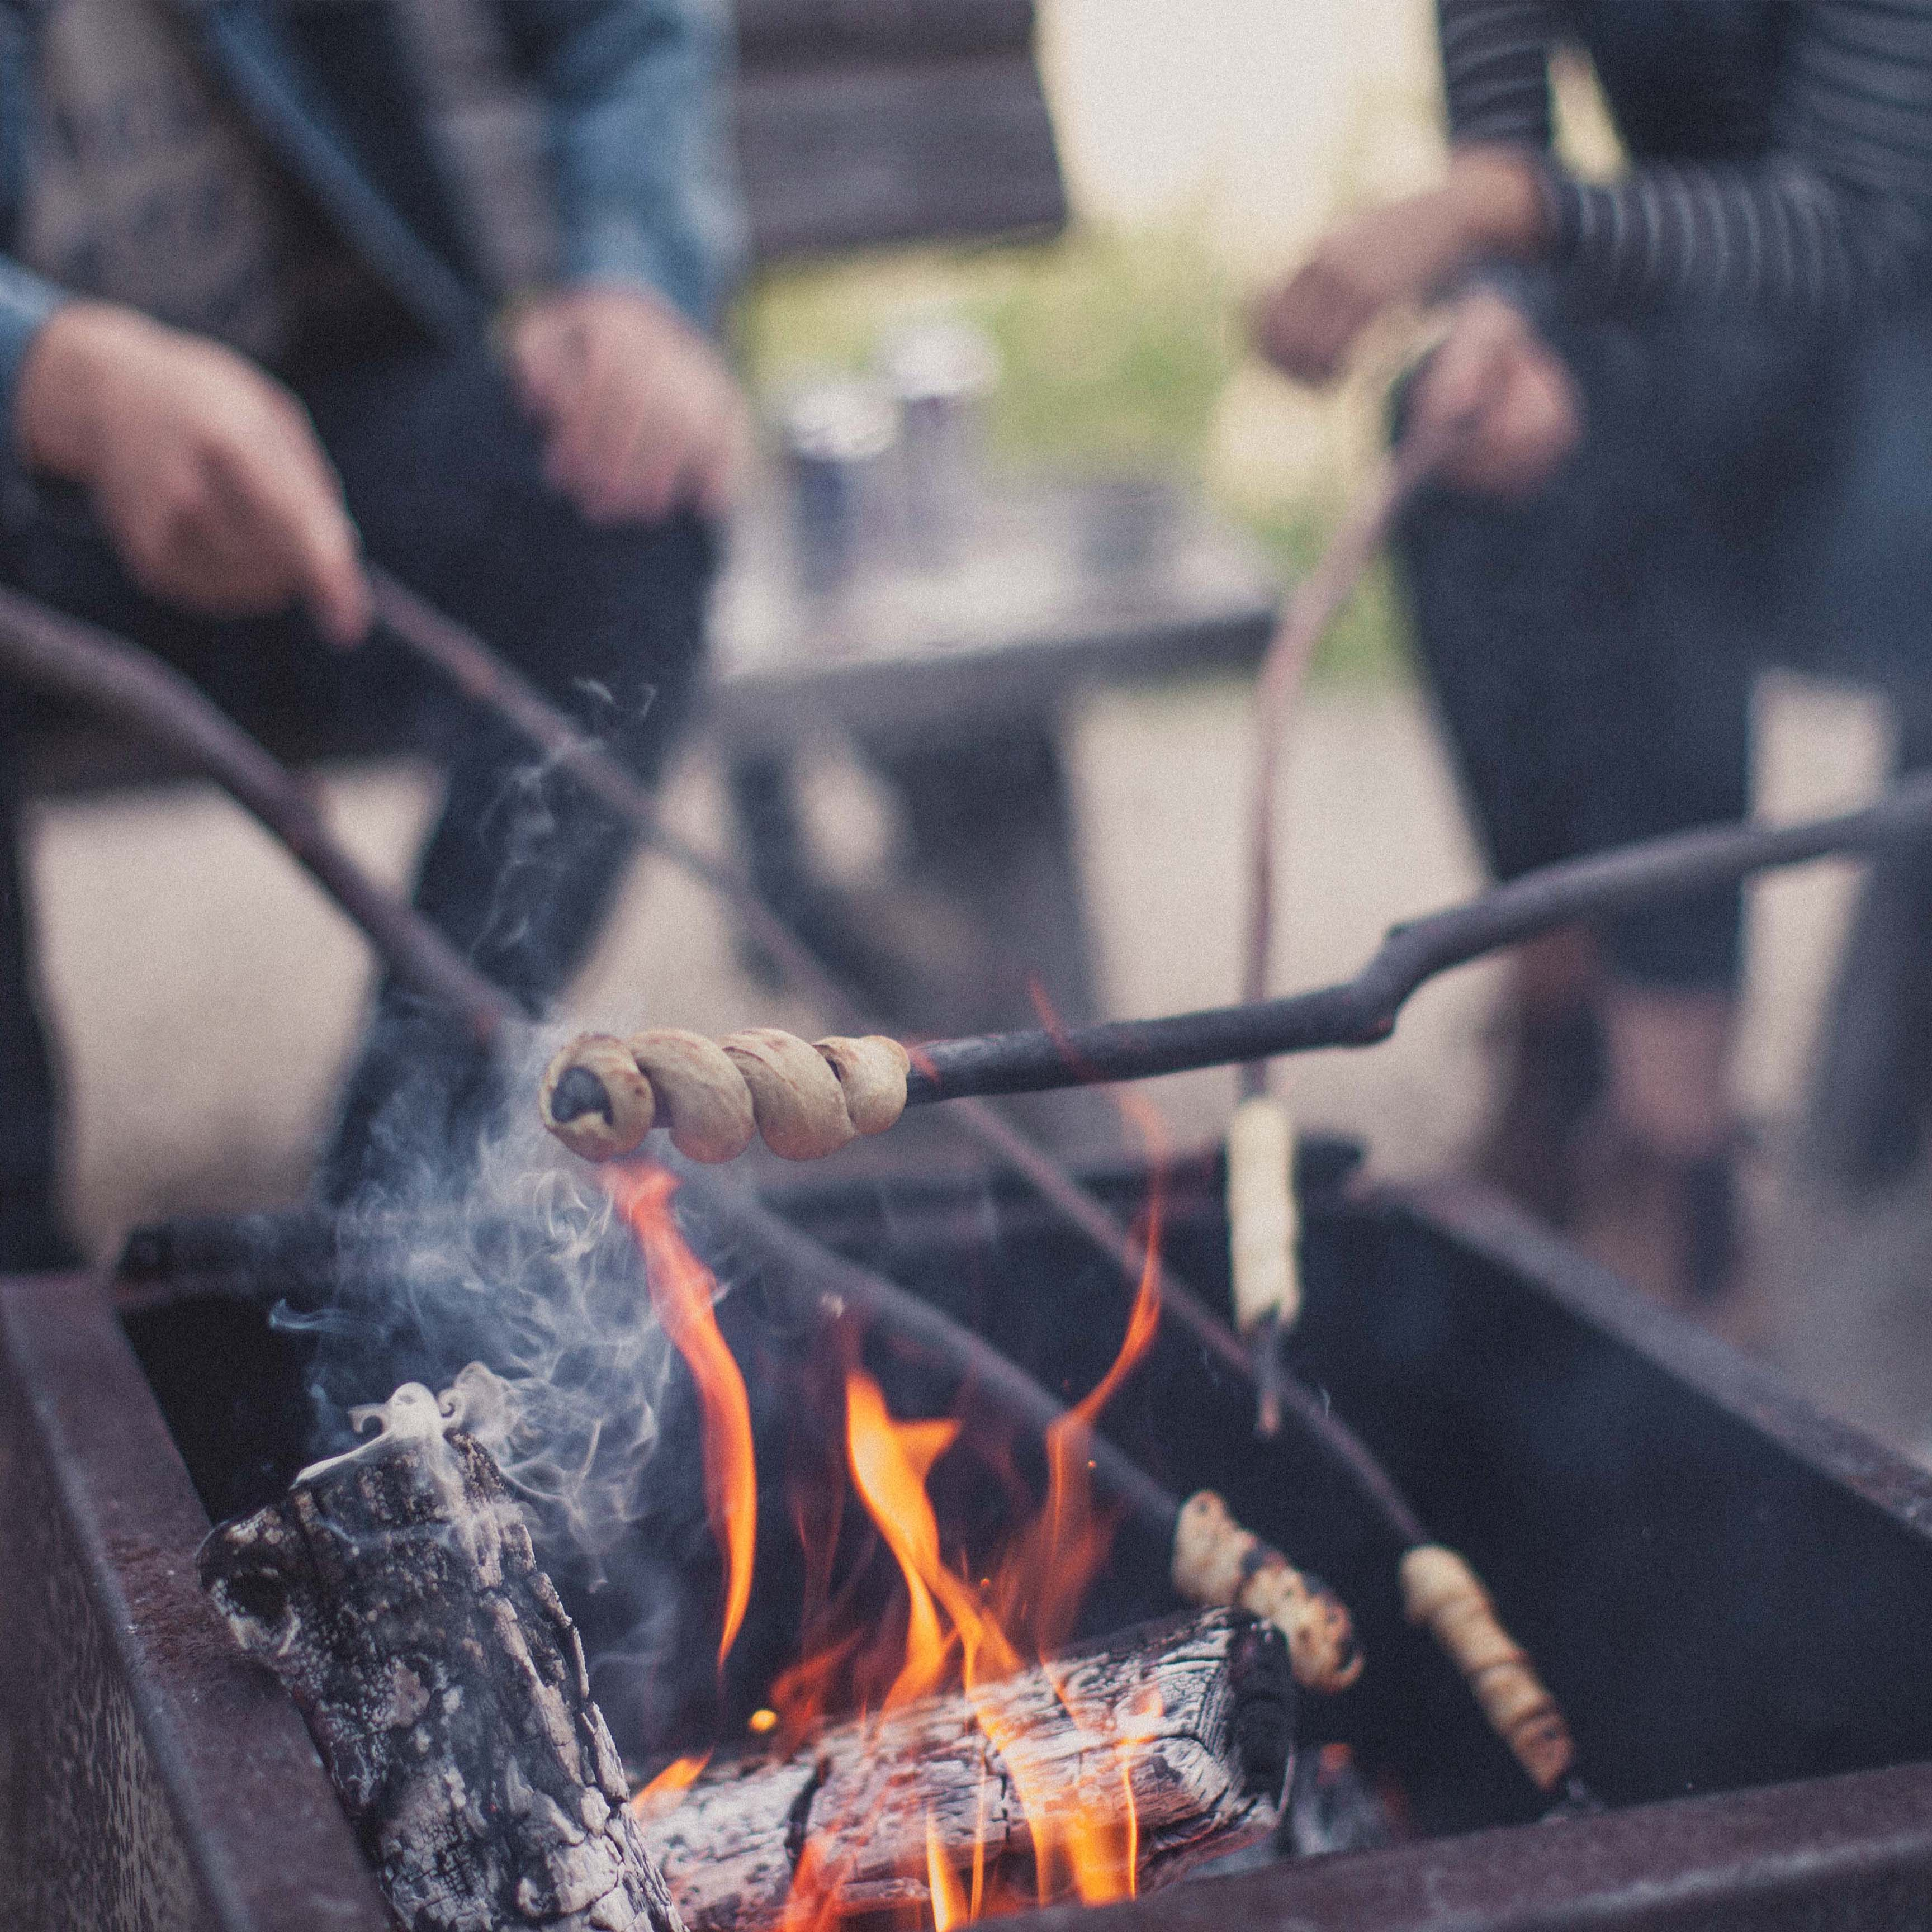 Roasting bannock over a bonfire